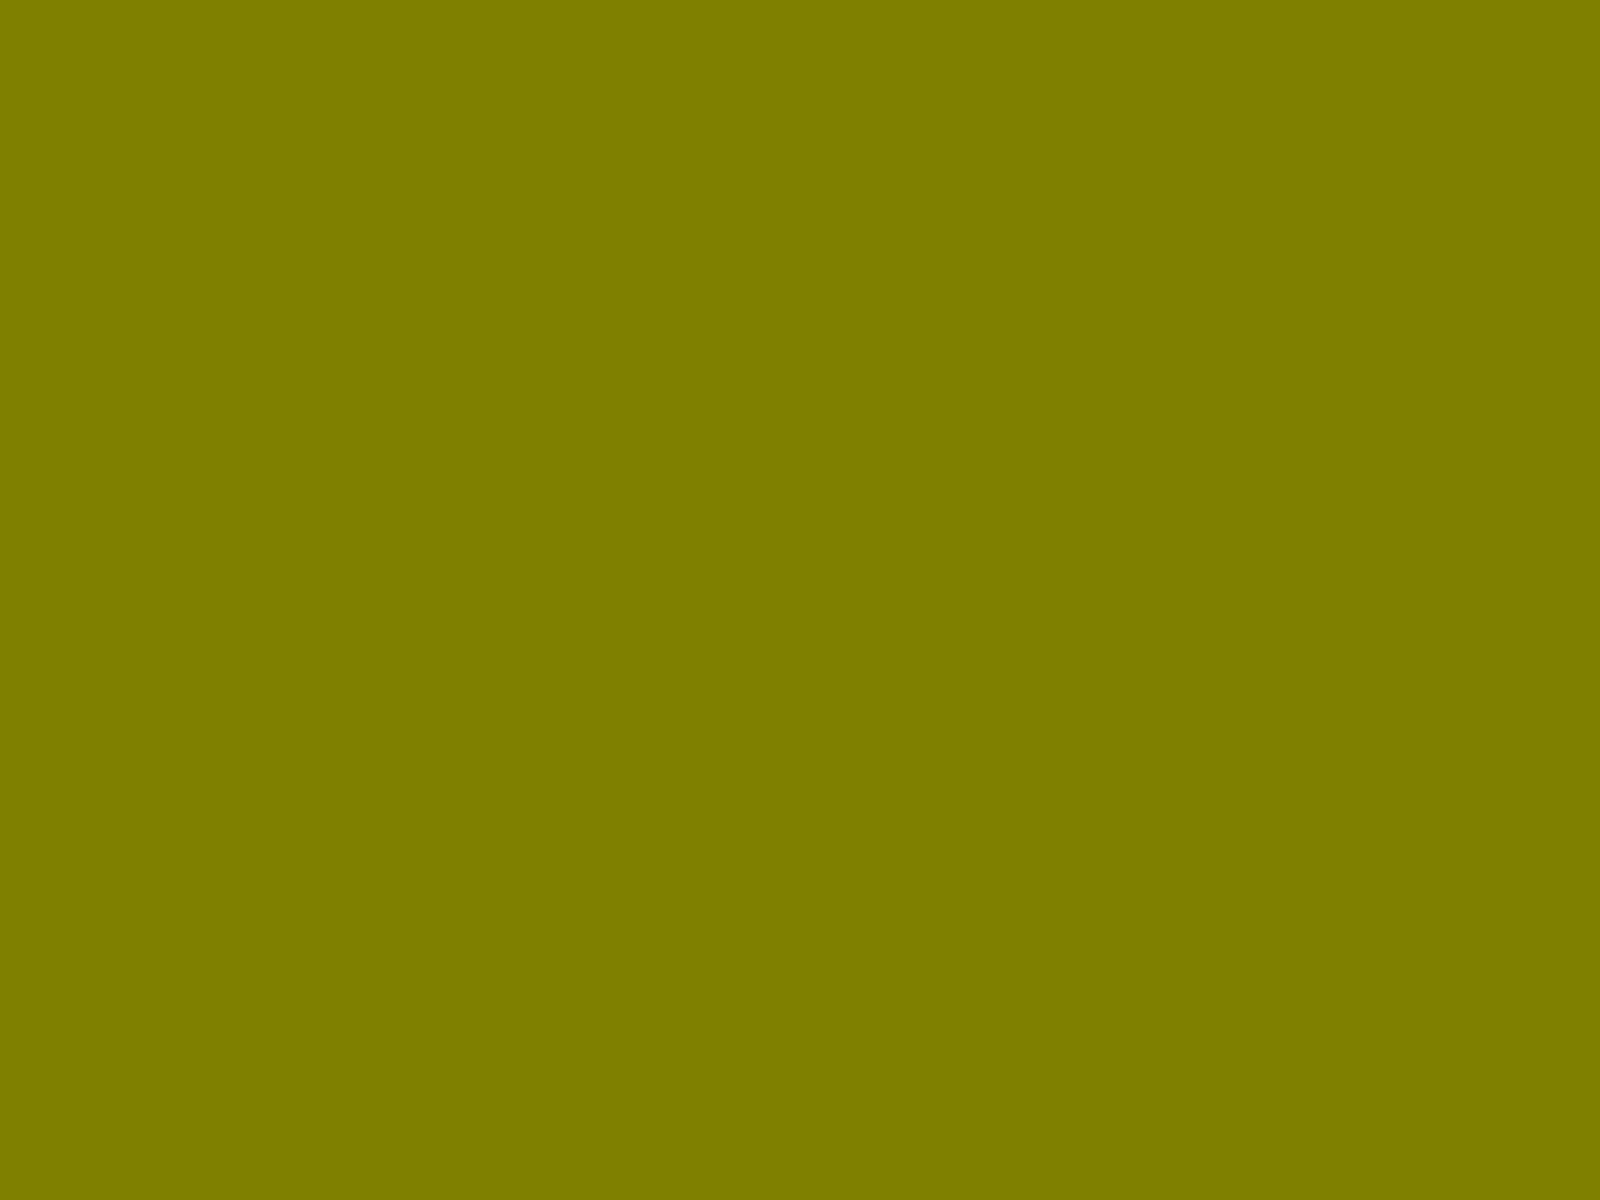 1600x1200 Olive Solid Color Background